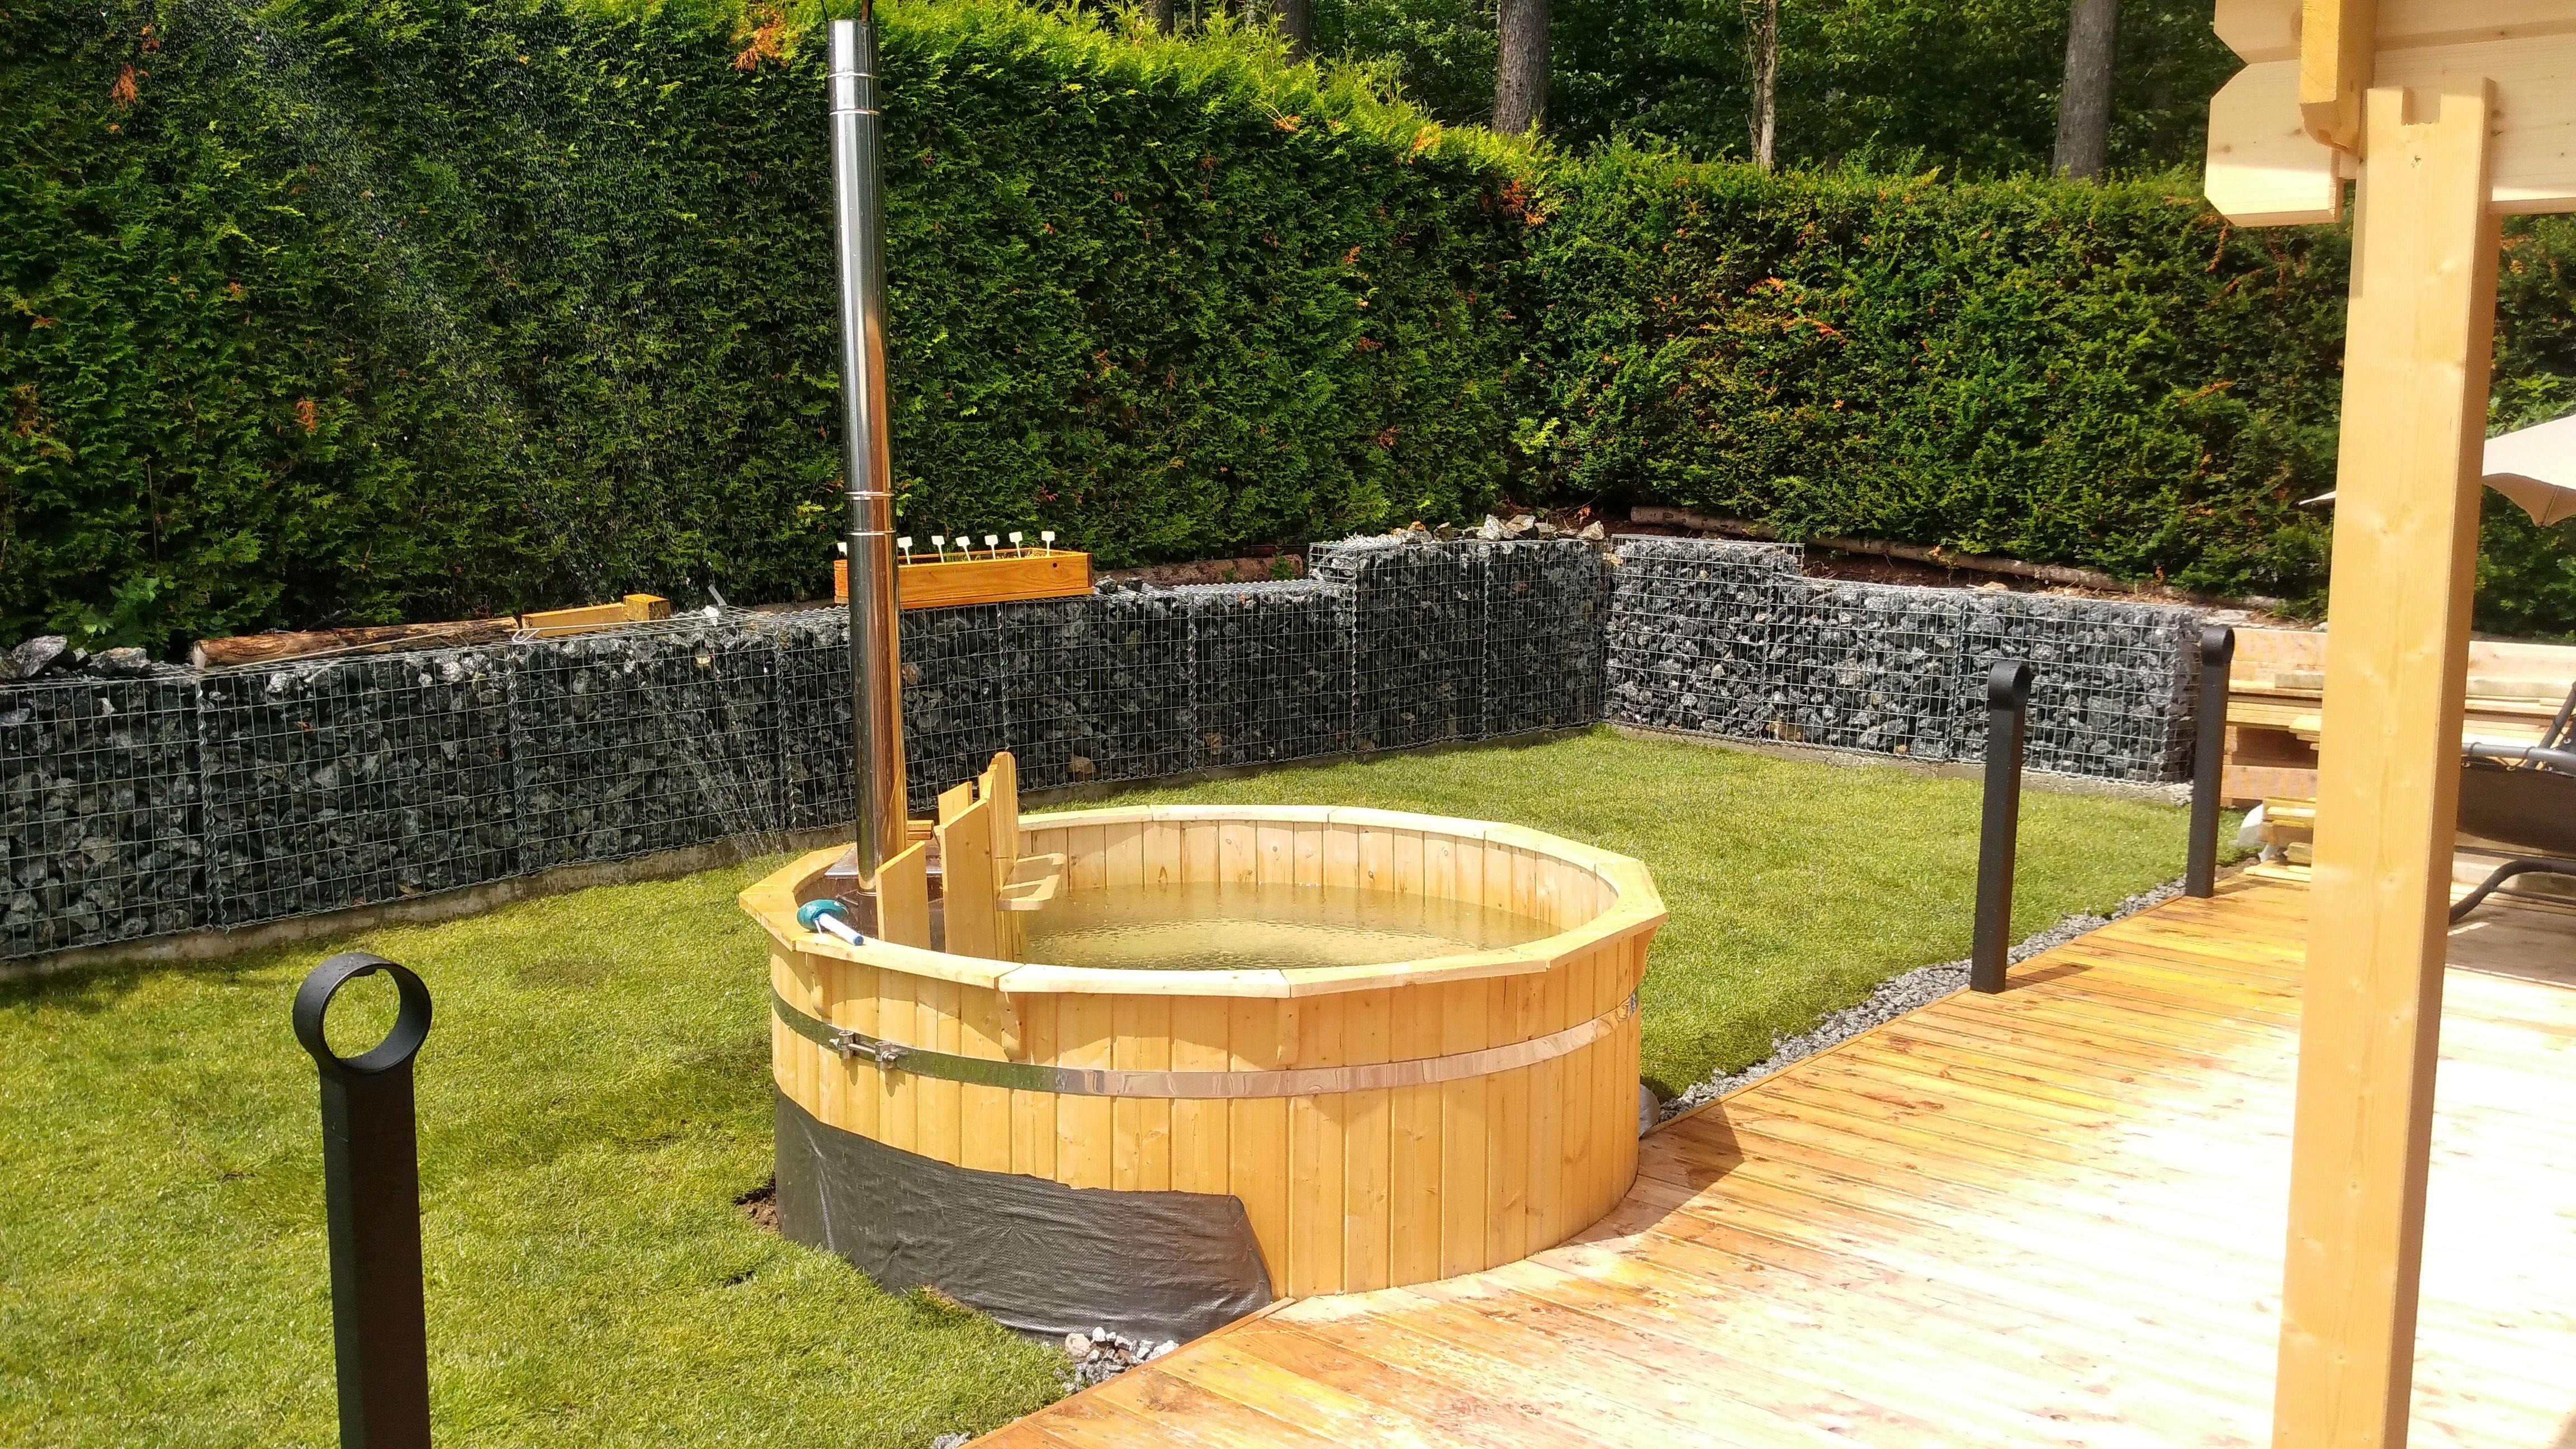 Tag 24 Rasen Beleuchtung Und Sprinkler Outdoor Decor Outdoor Hot Tub